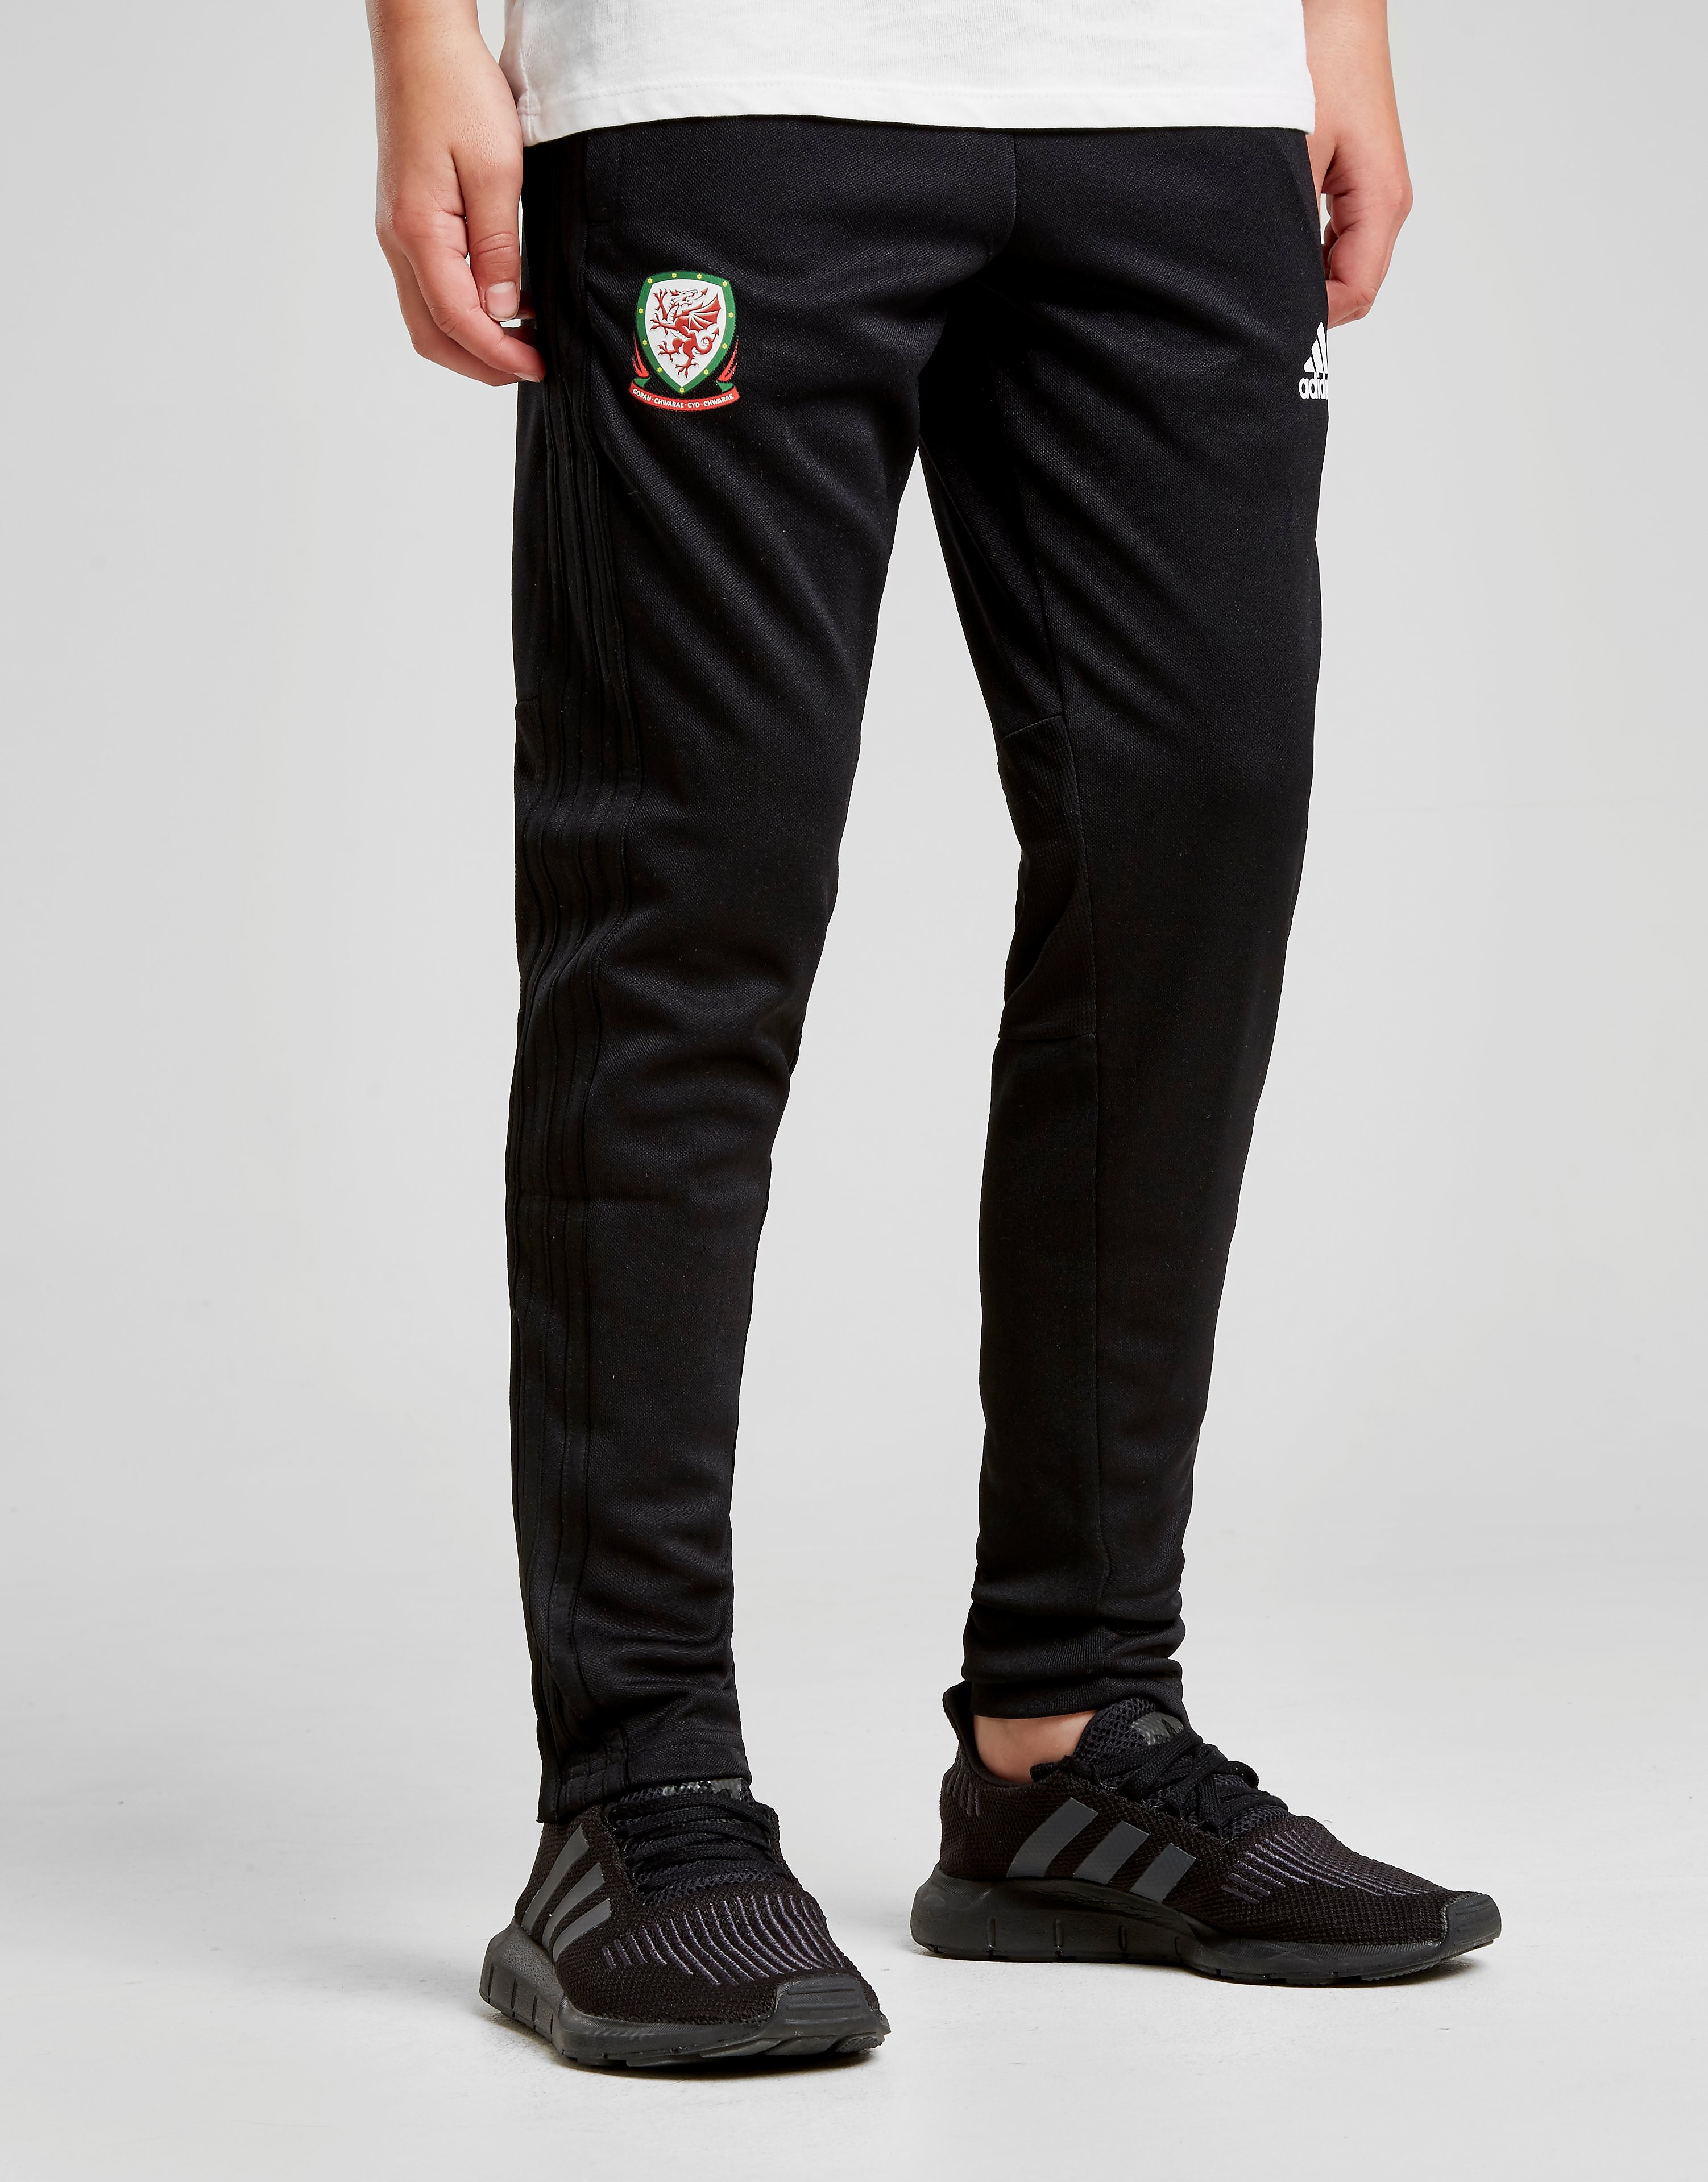 adidas FA Wales 2018 Training Pants Junior